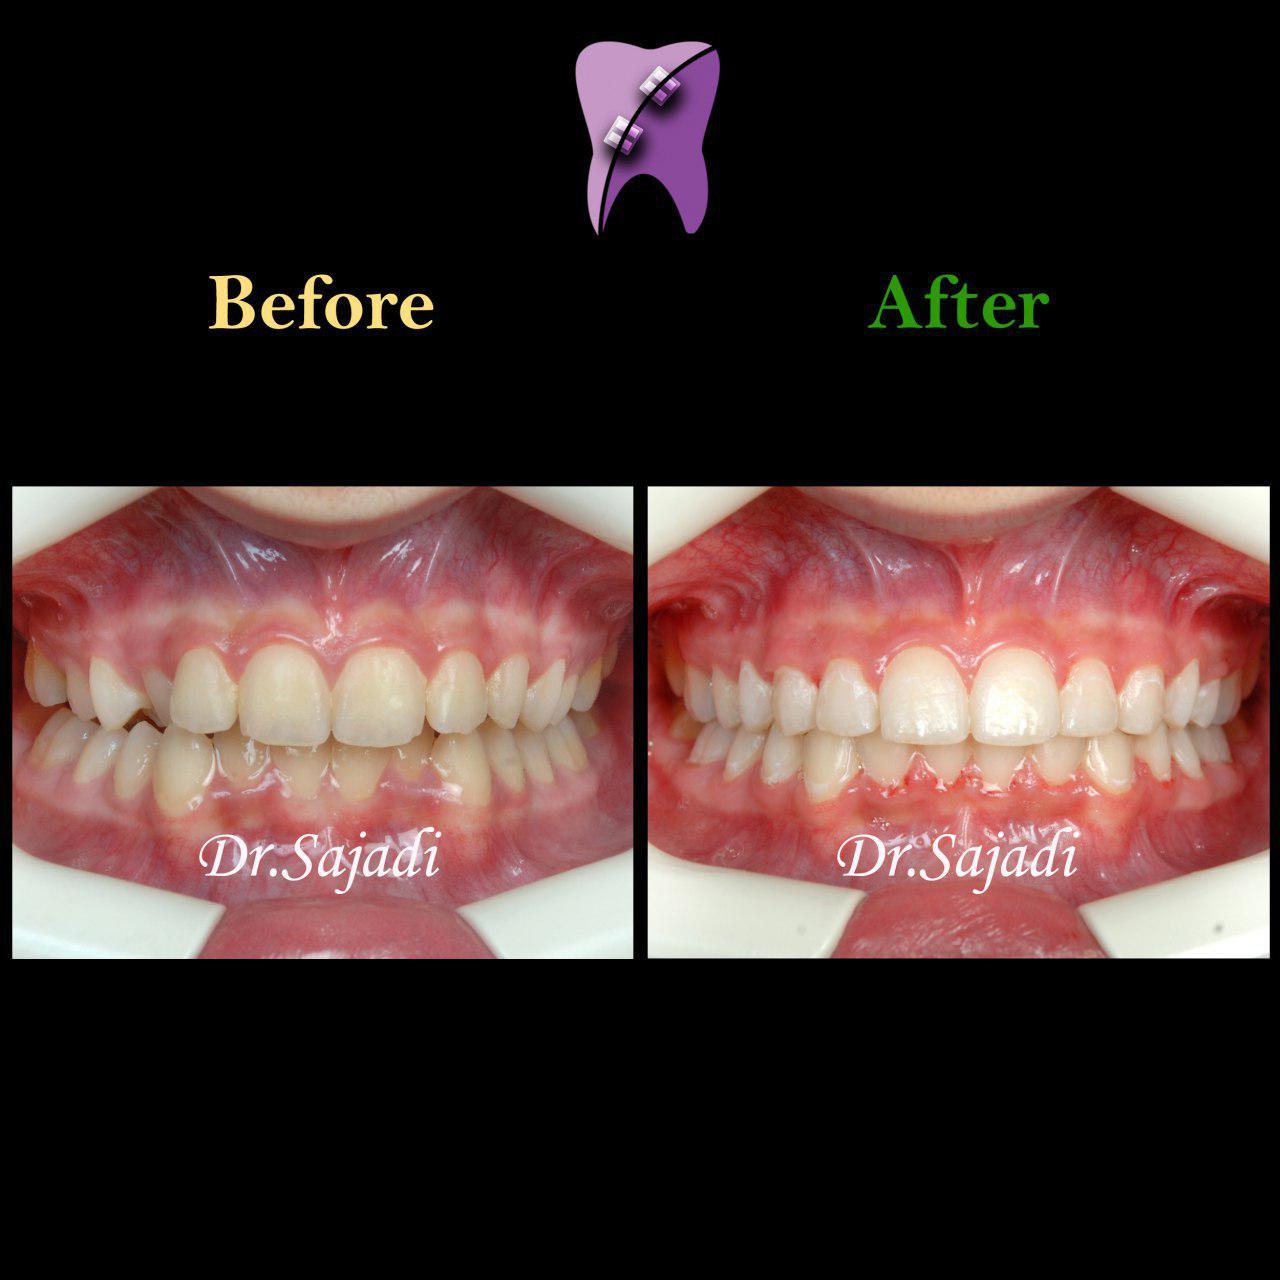 photo 2019 12 23 10 55 56 - درمان ارتودنسي بيمار با نارضايتي از بي نظمي دندان